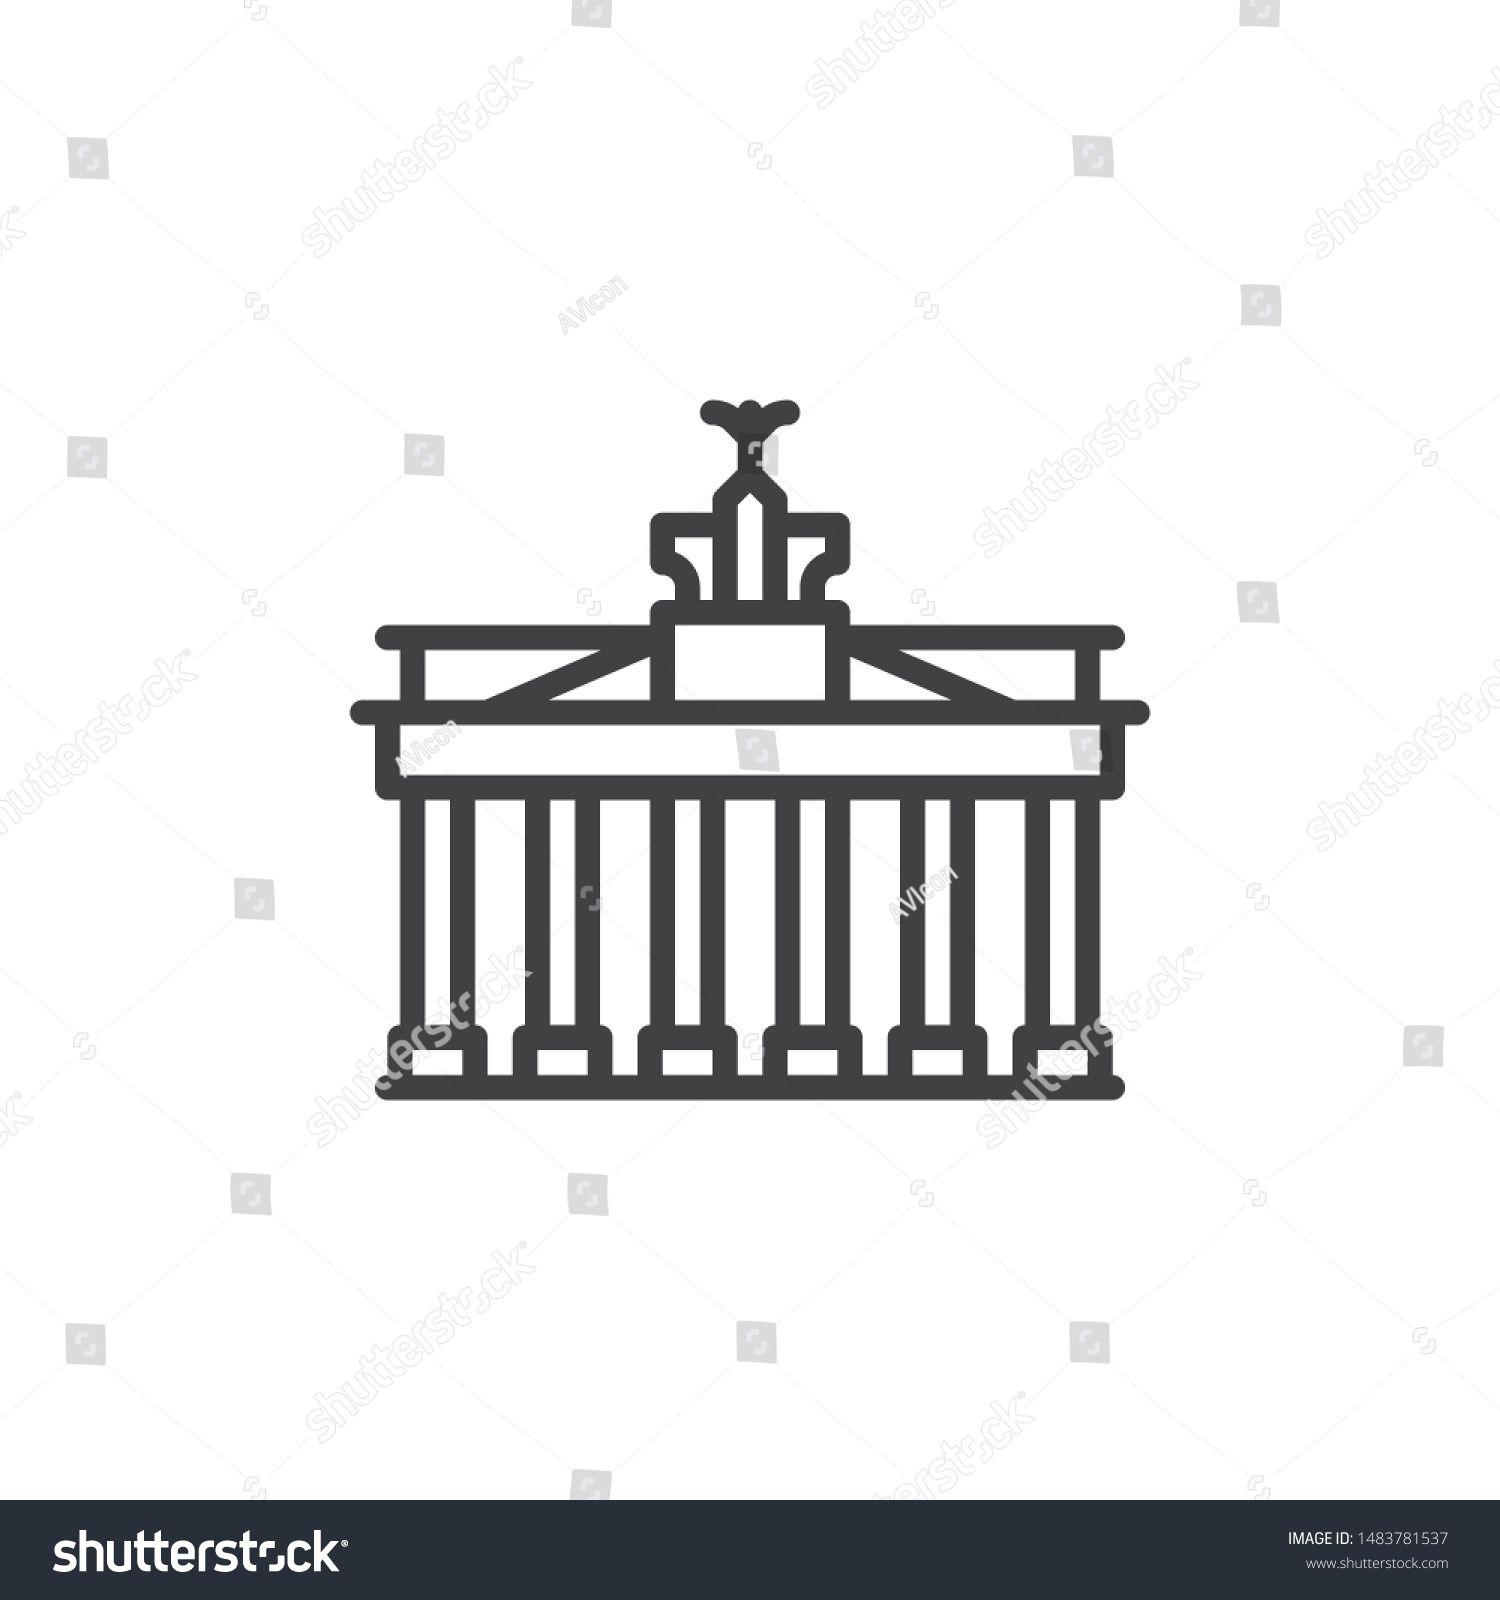 Berlin City Landmark Line Icon Linear Style Sign For Mobile Concept And Web Design Brandenburg Gate Outline In 2020 Abstract Images Travel Symbols Logo Illustration